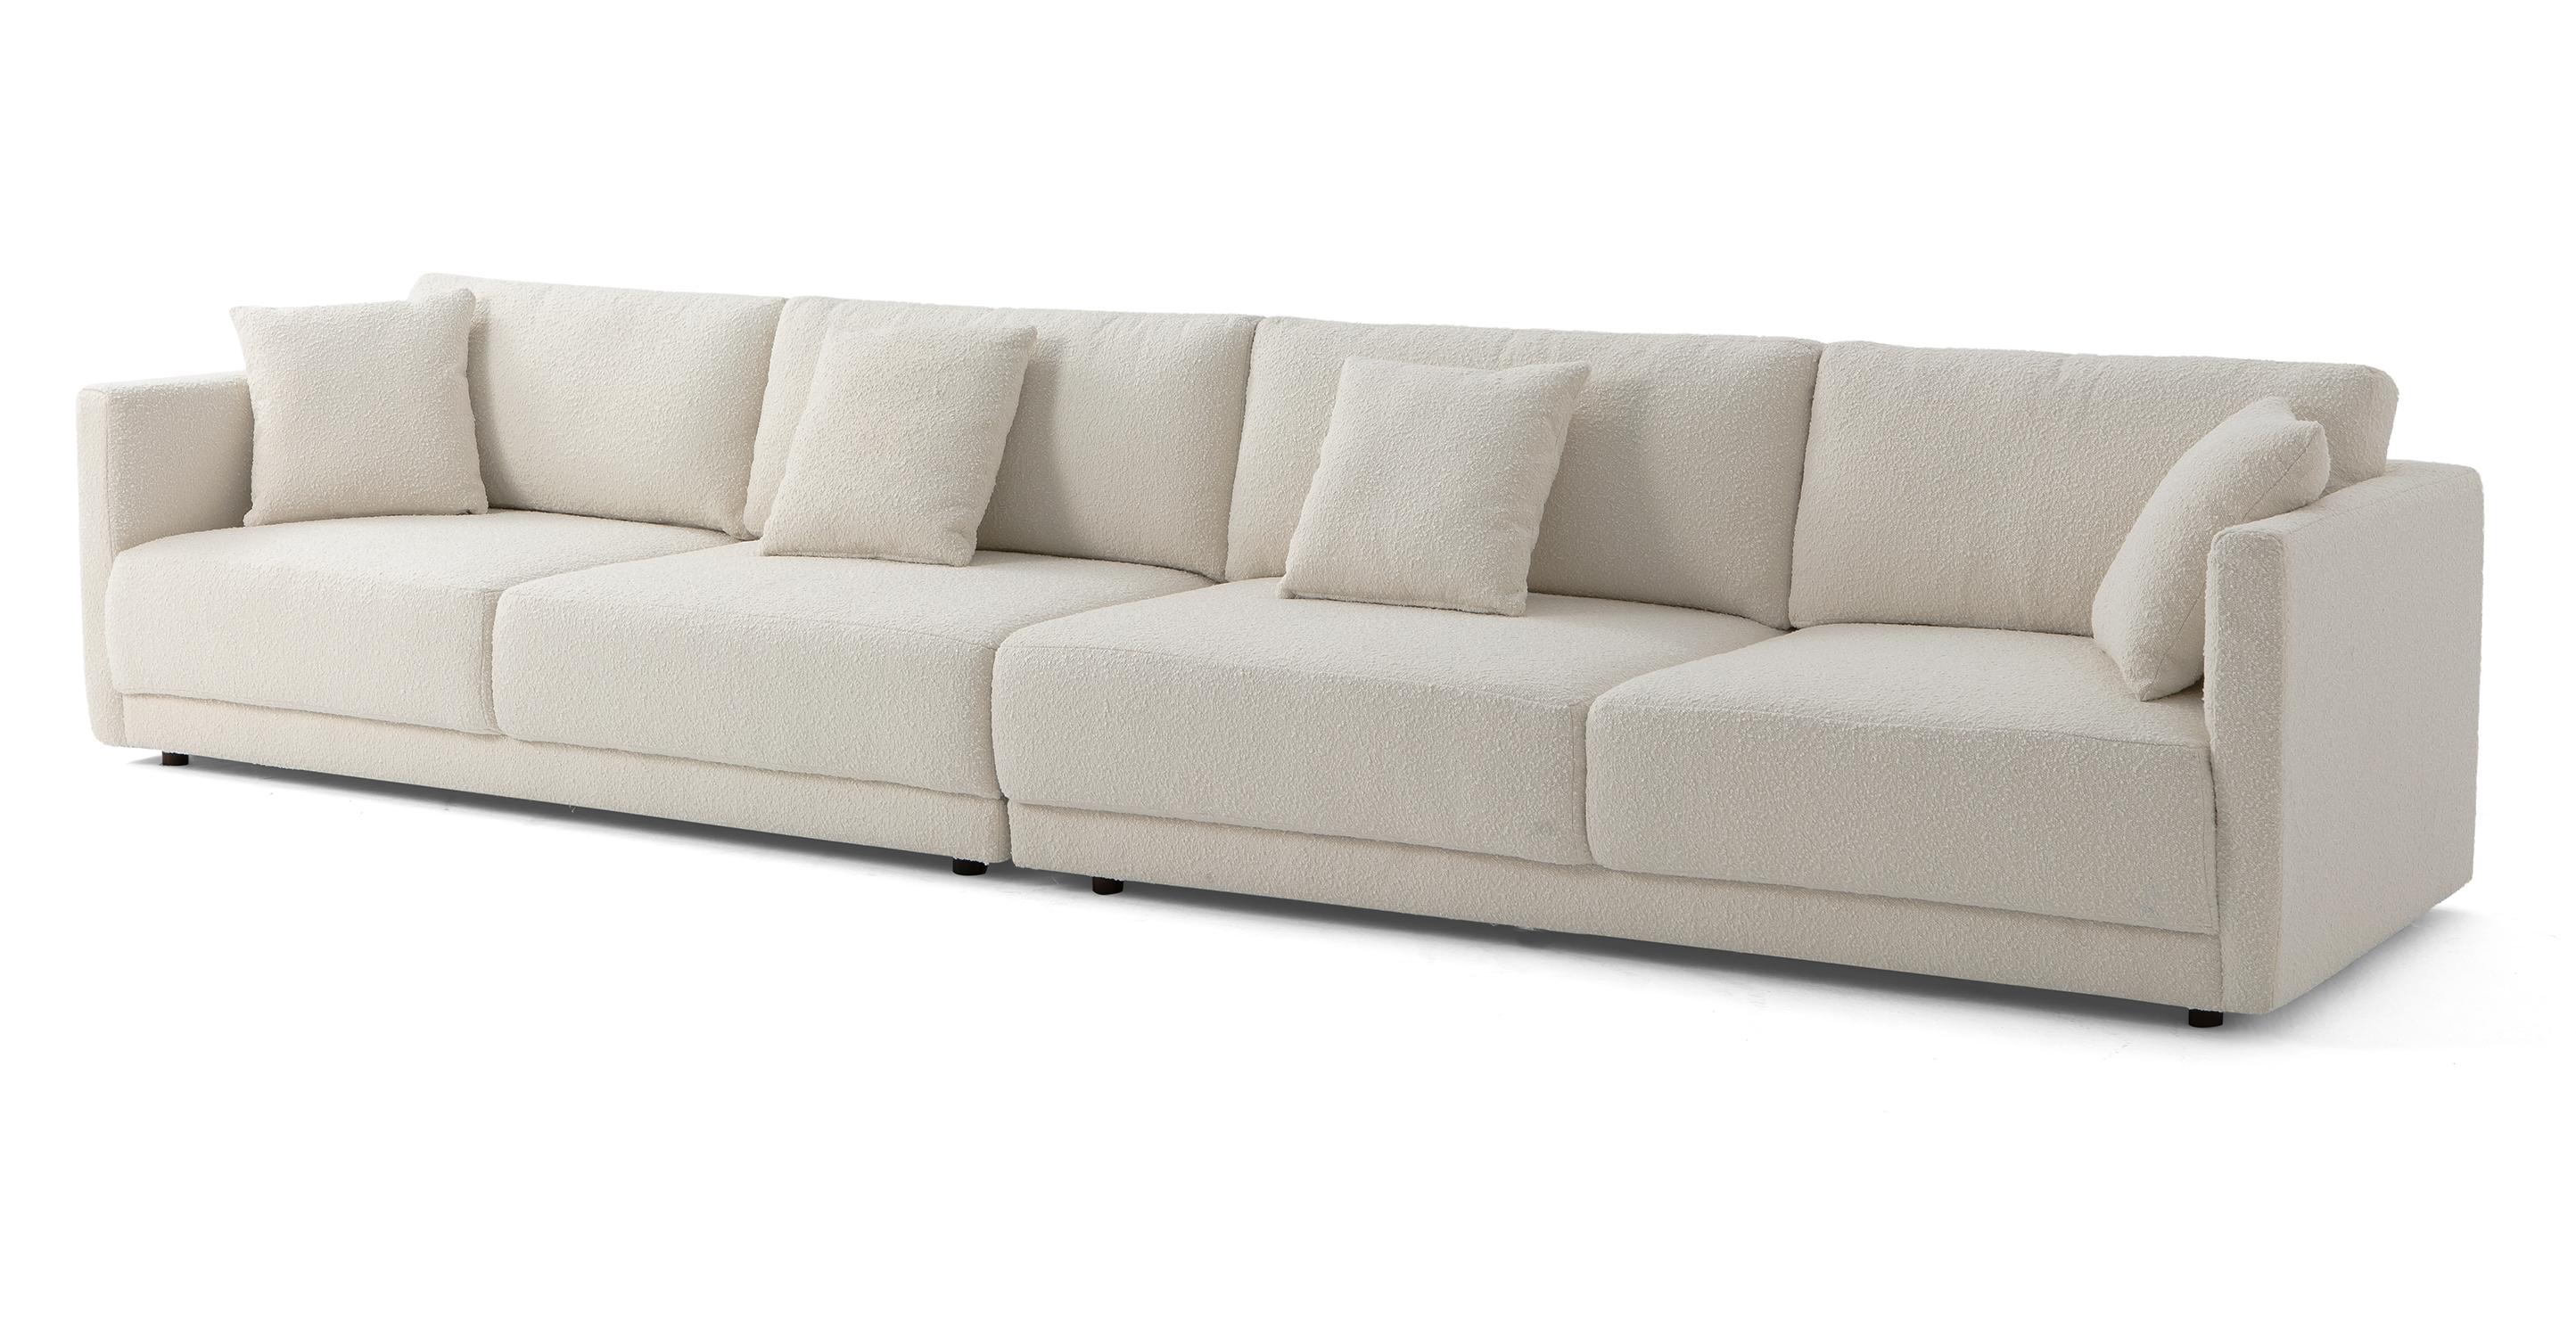 "Domus 154"" 2-pc Long Sofa Sectional, Blanc Boucle"